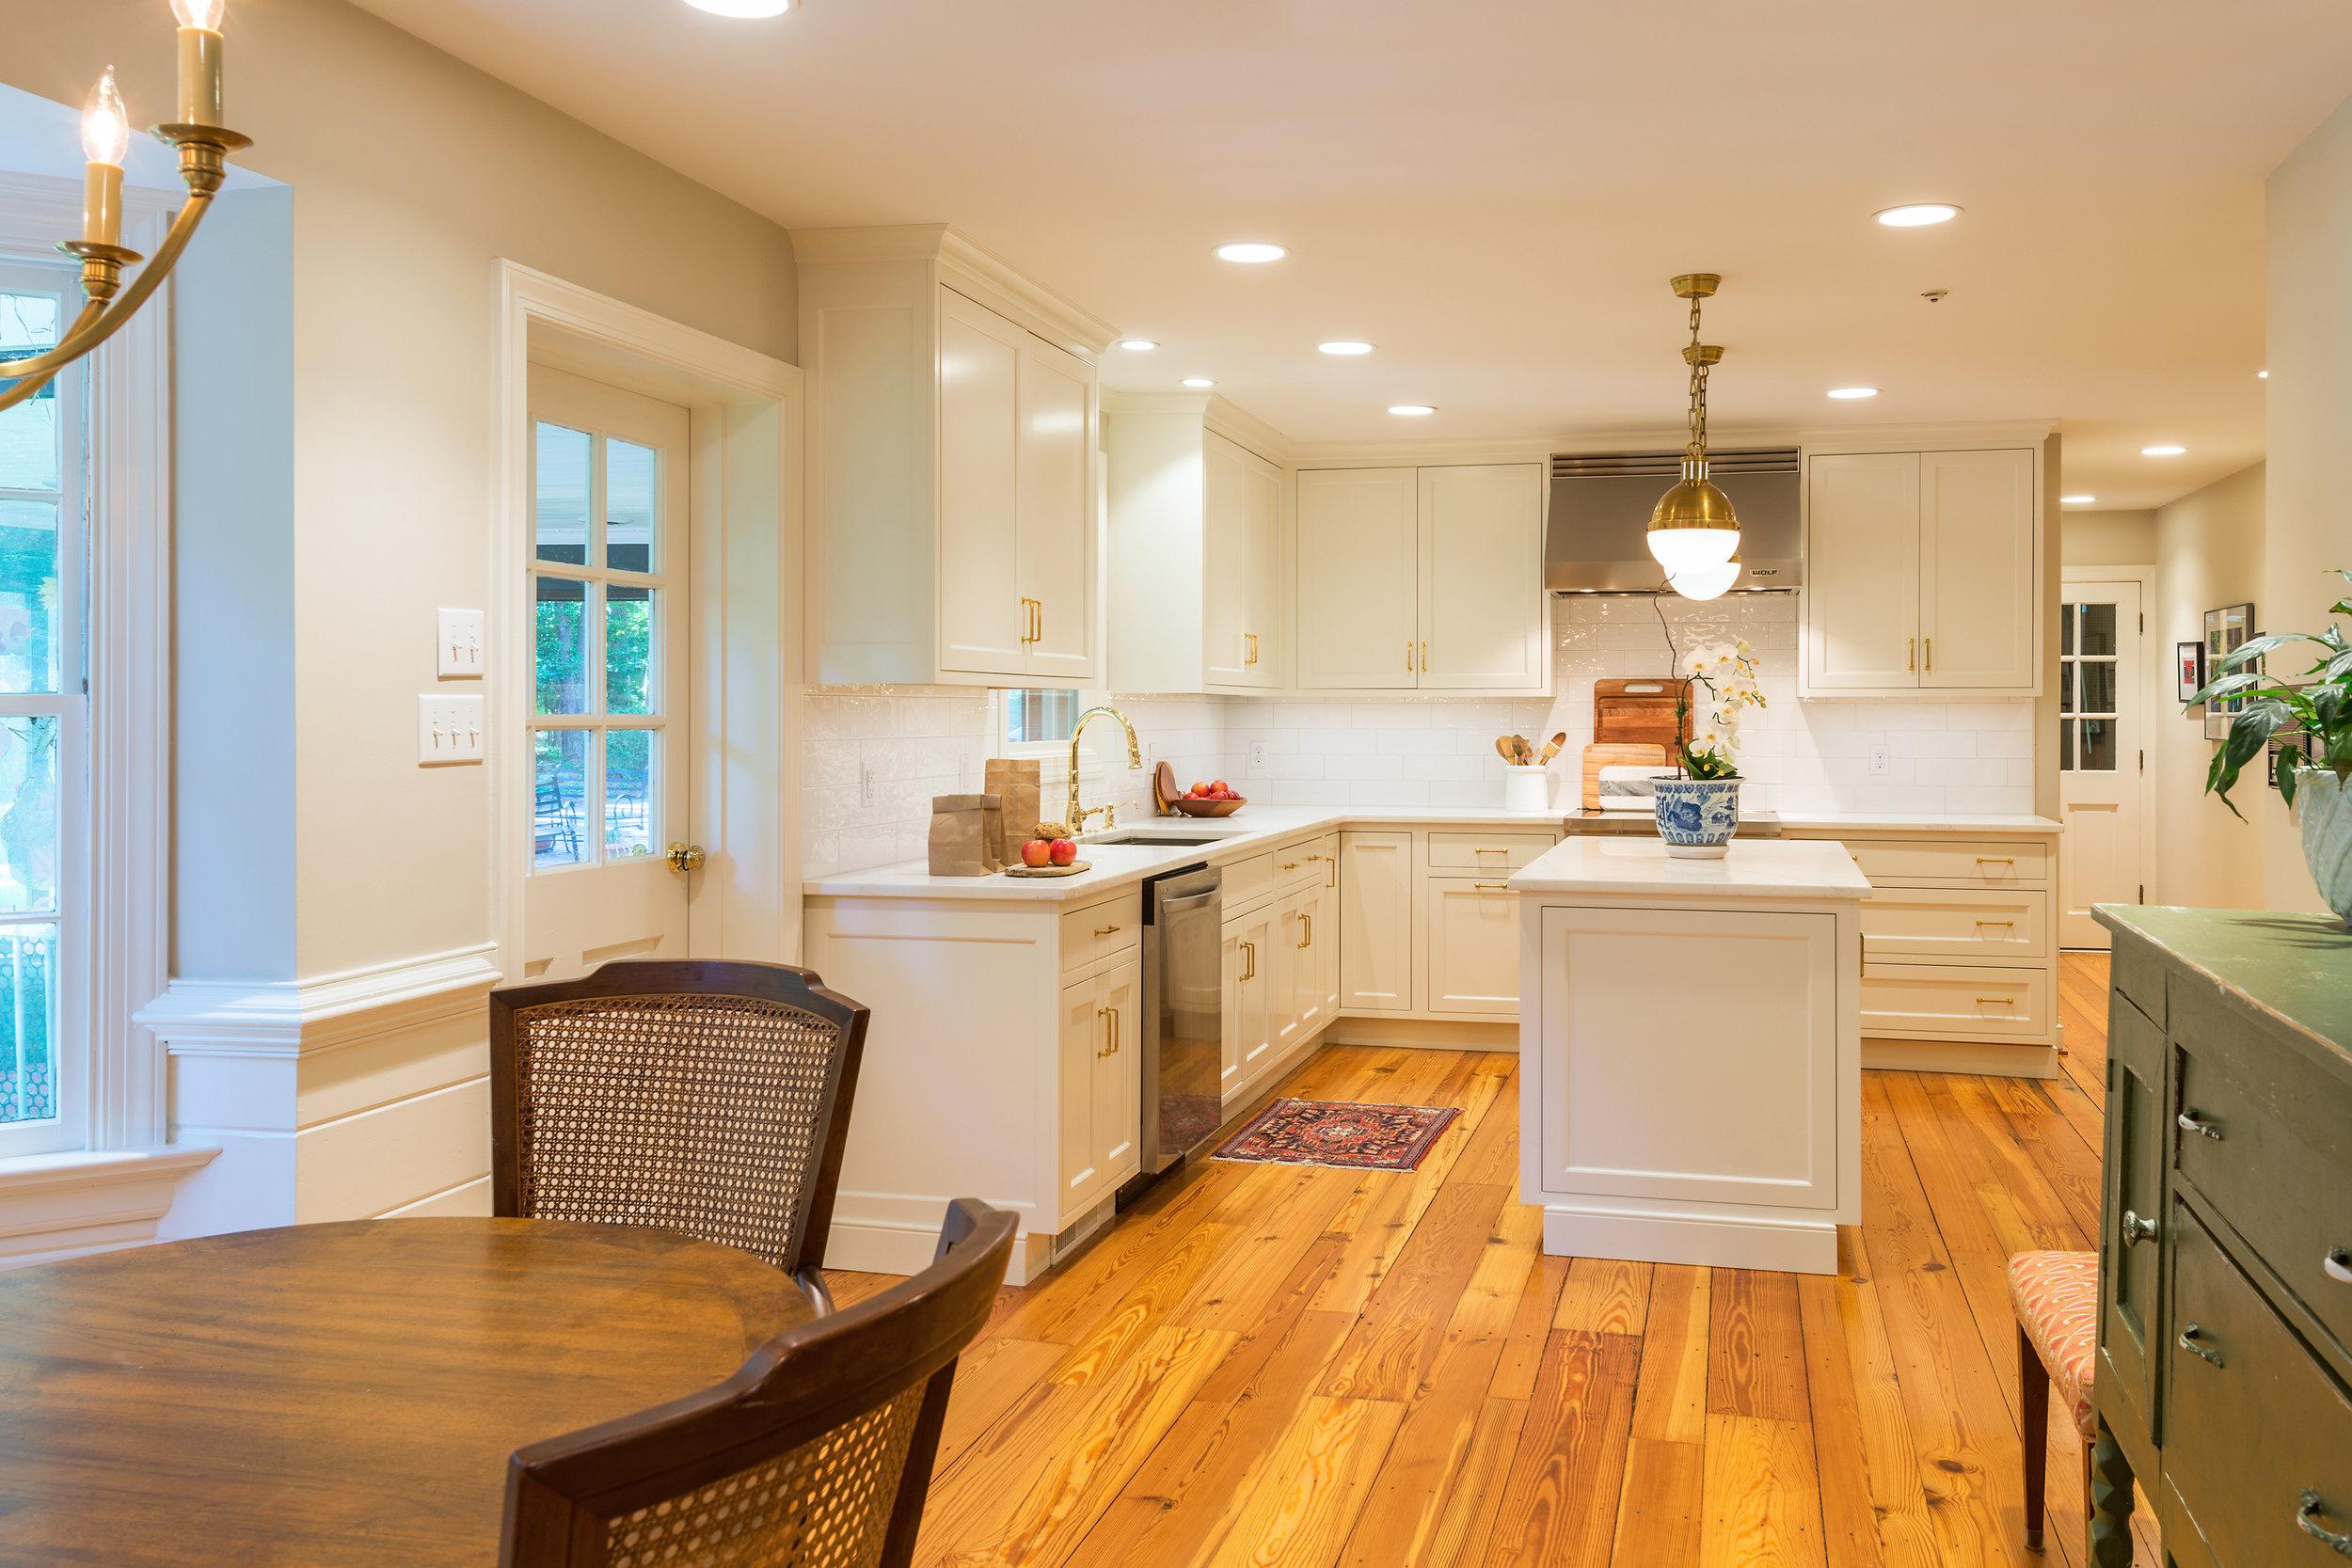 custom kitchens farmhouse kitchen tables visit our award winning showroom for design inspiration